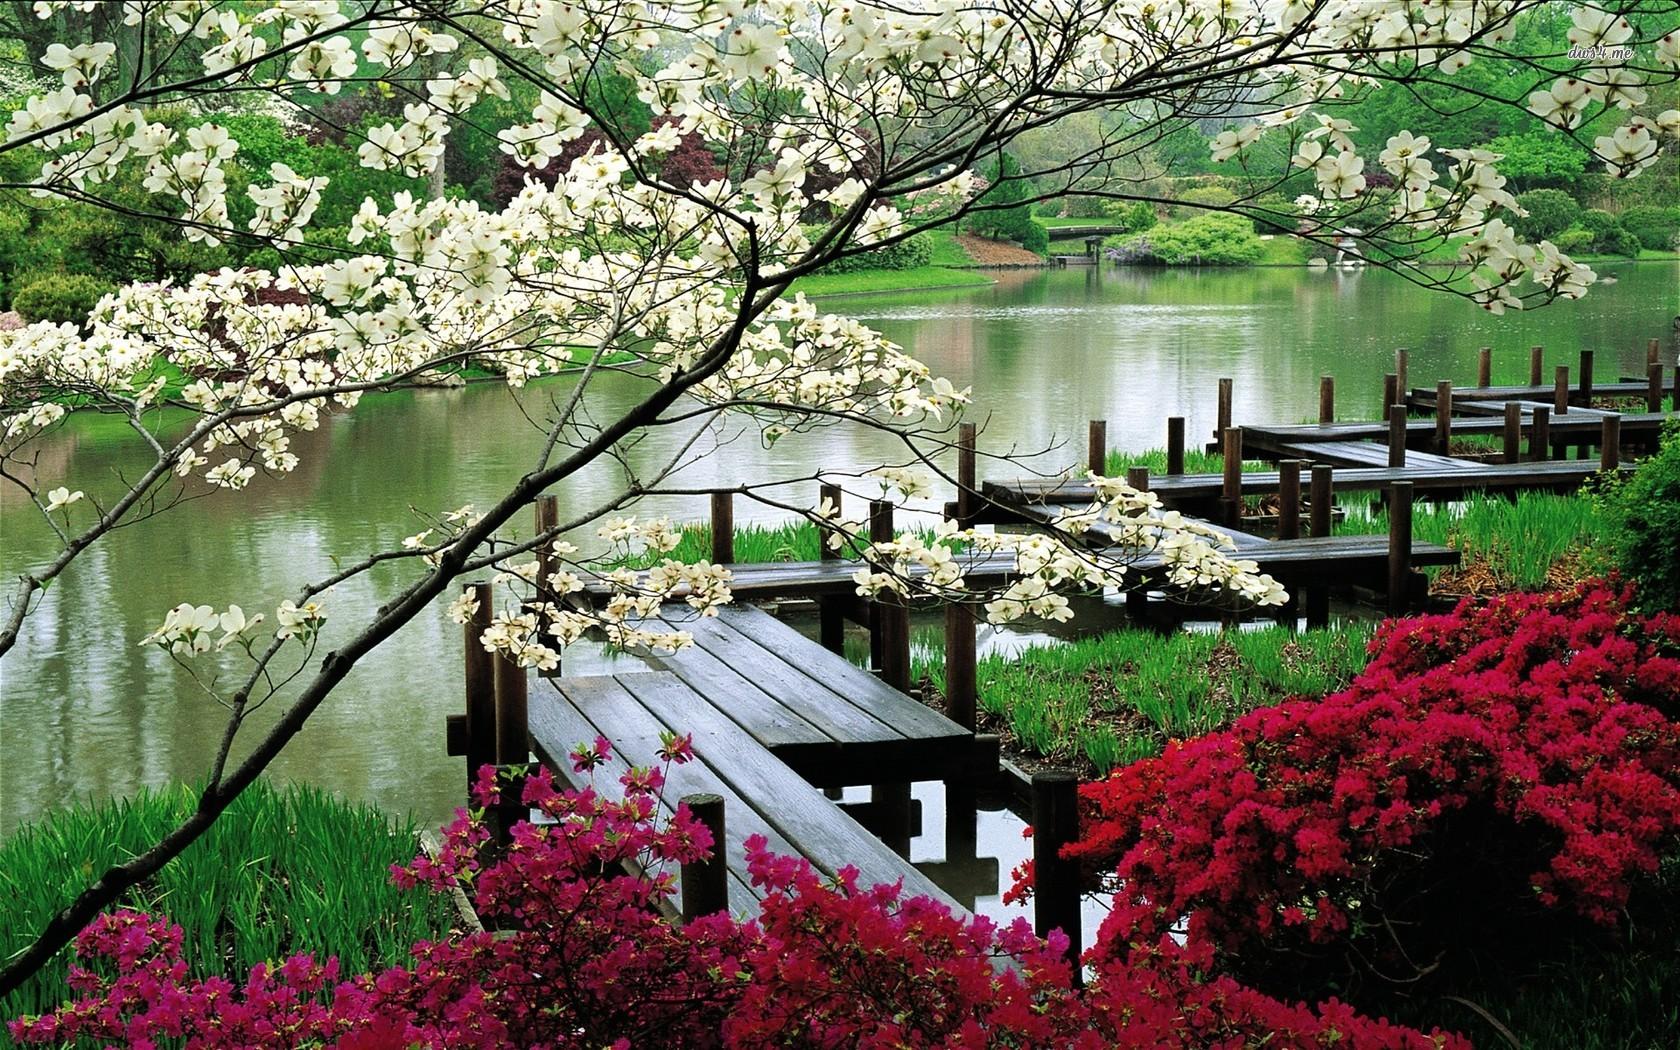 japanese garden wallpaper backgrounds wallpapersafari - Japanese Garden Wallpaper